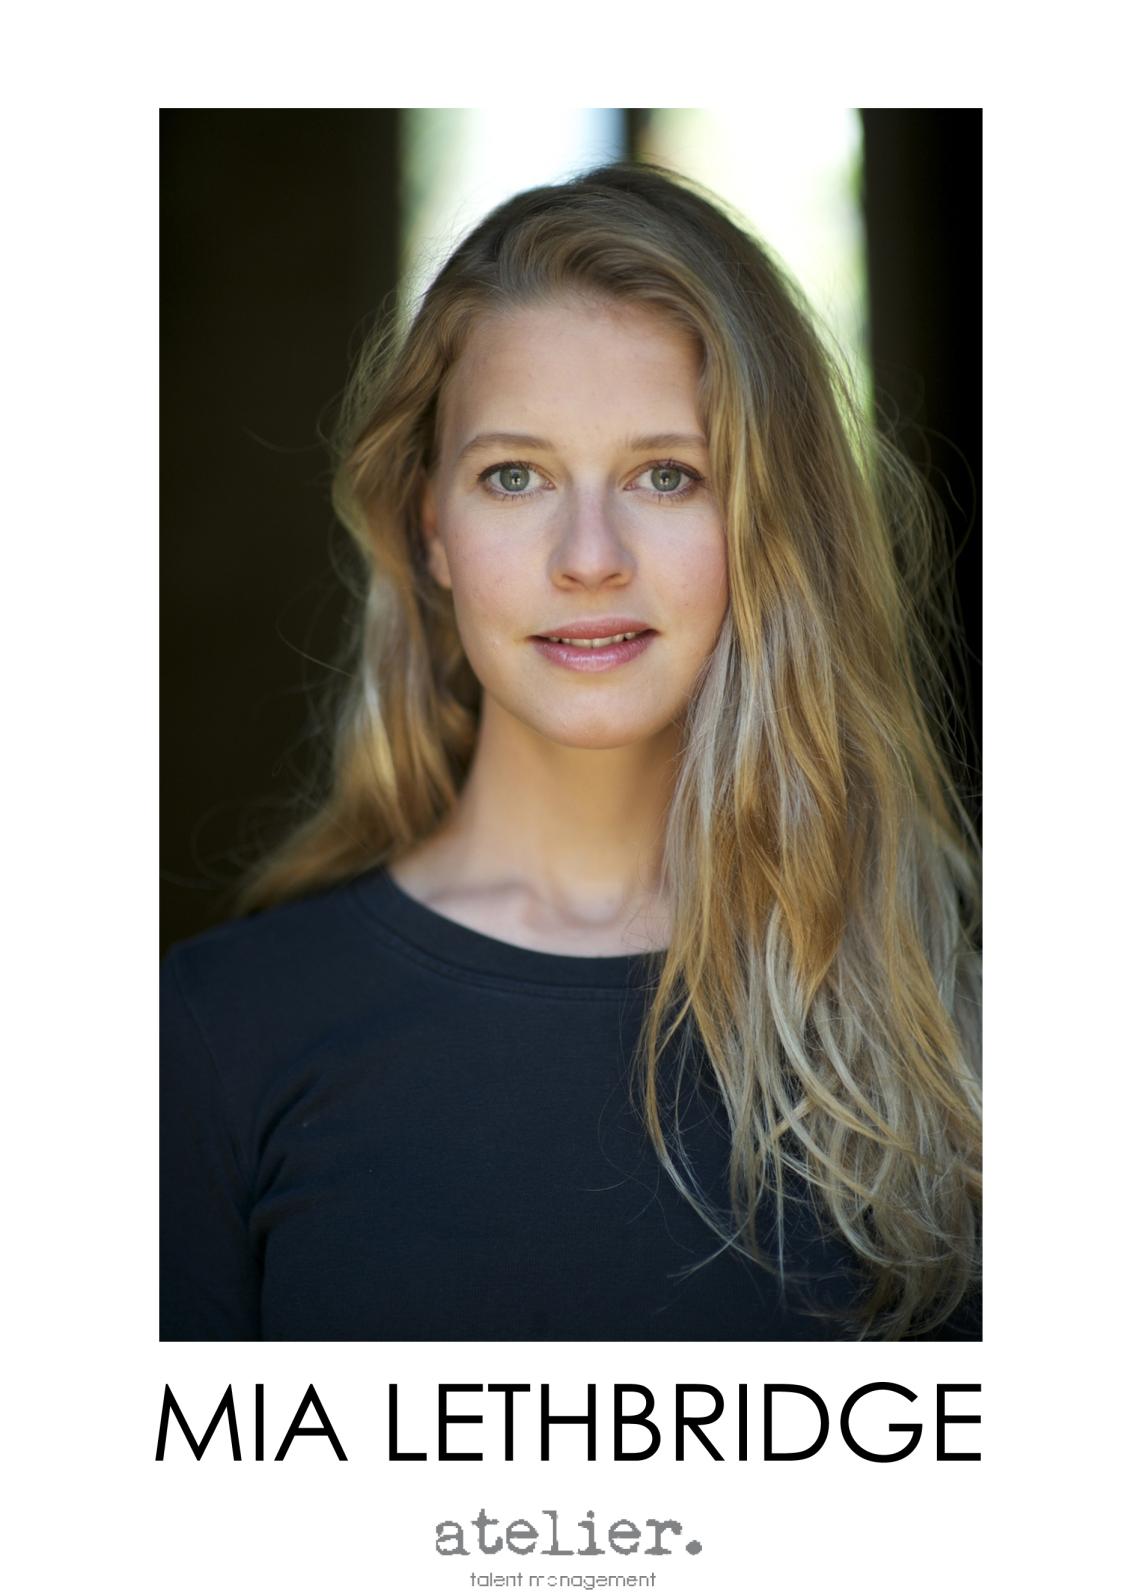 Mia Lethbridge